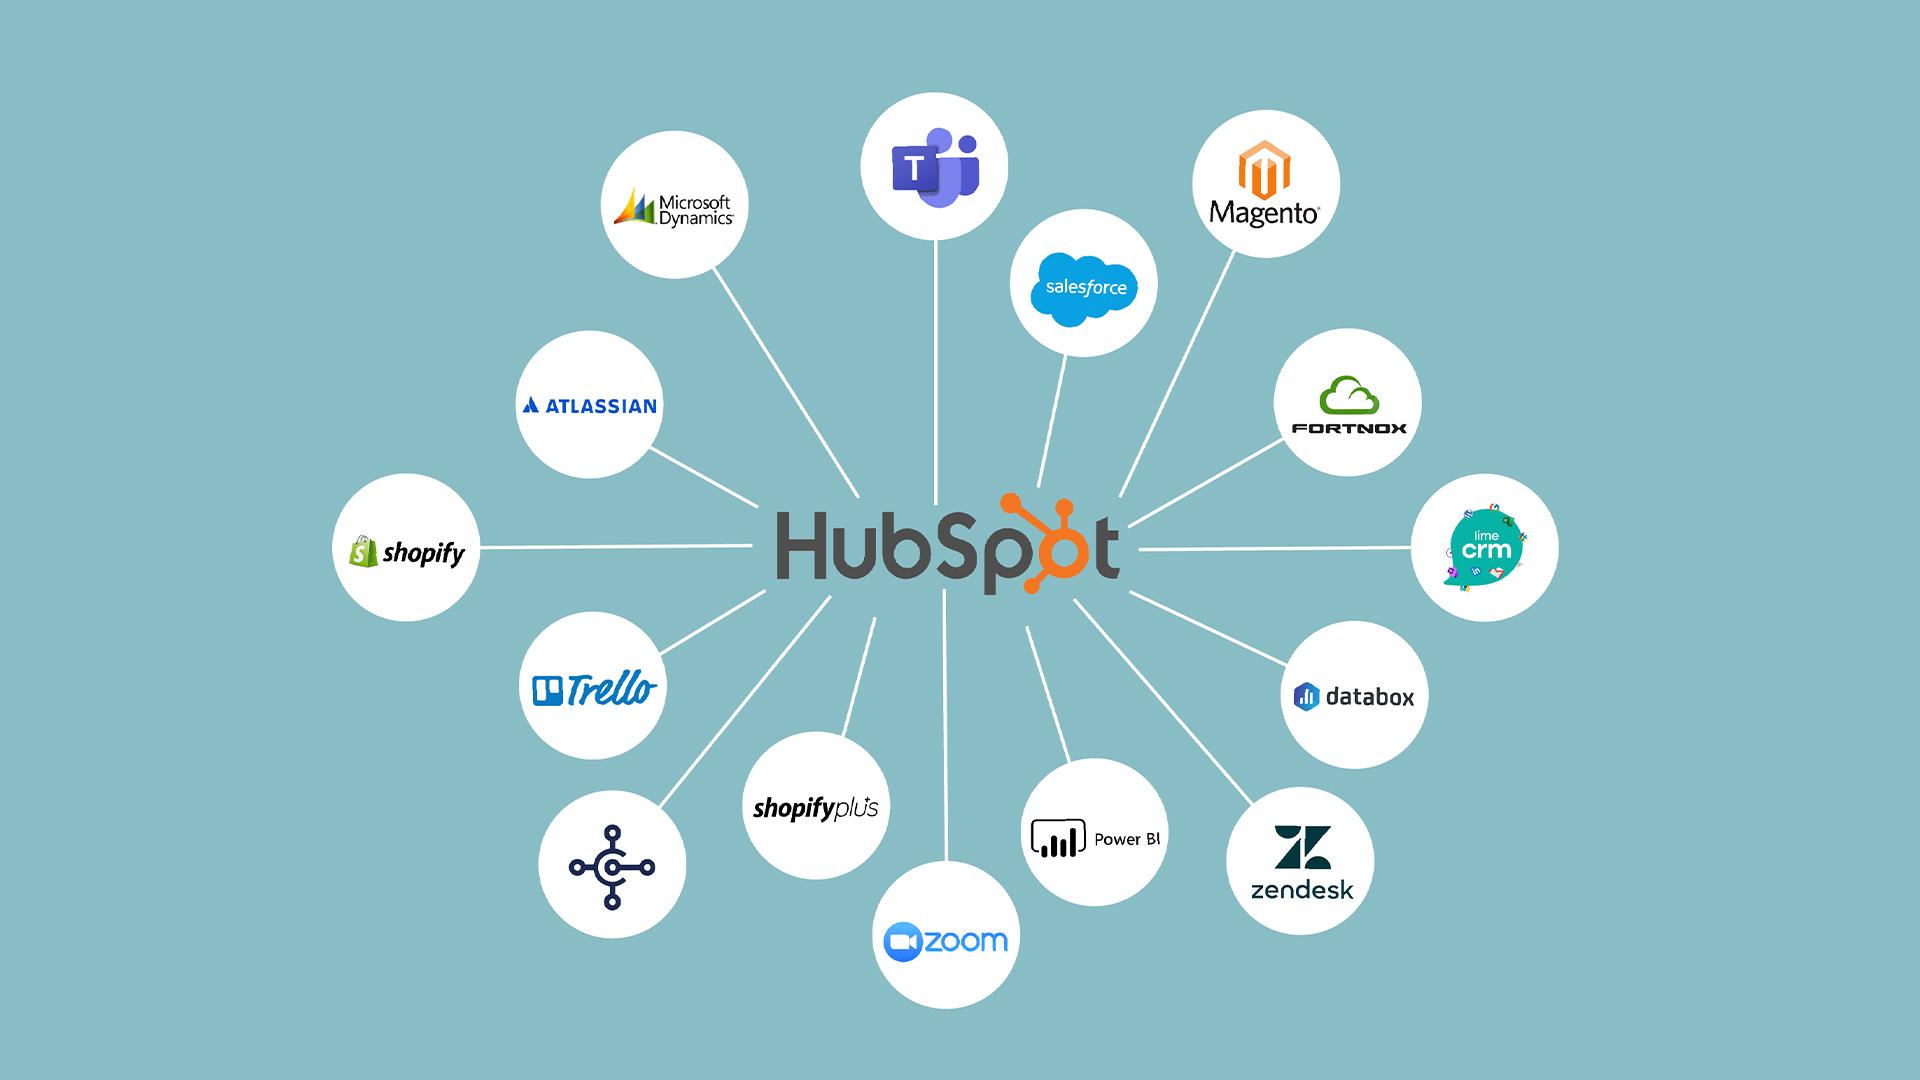 hubspot_integrations